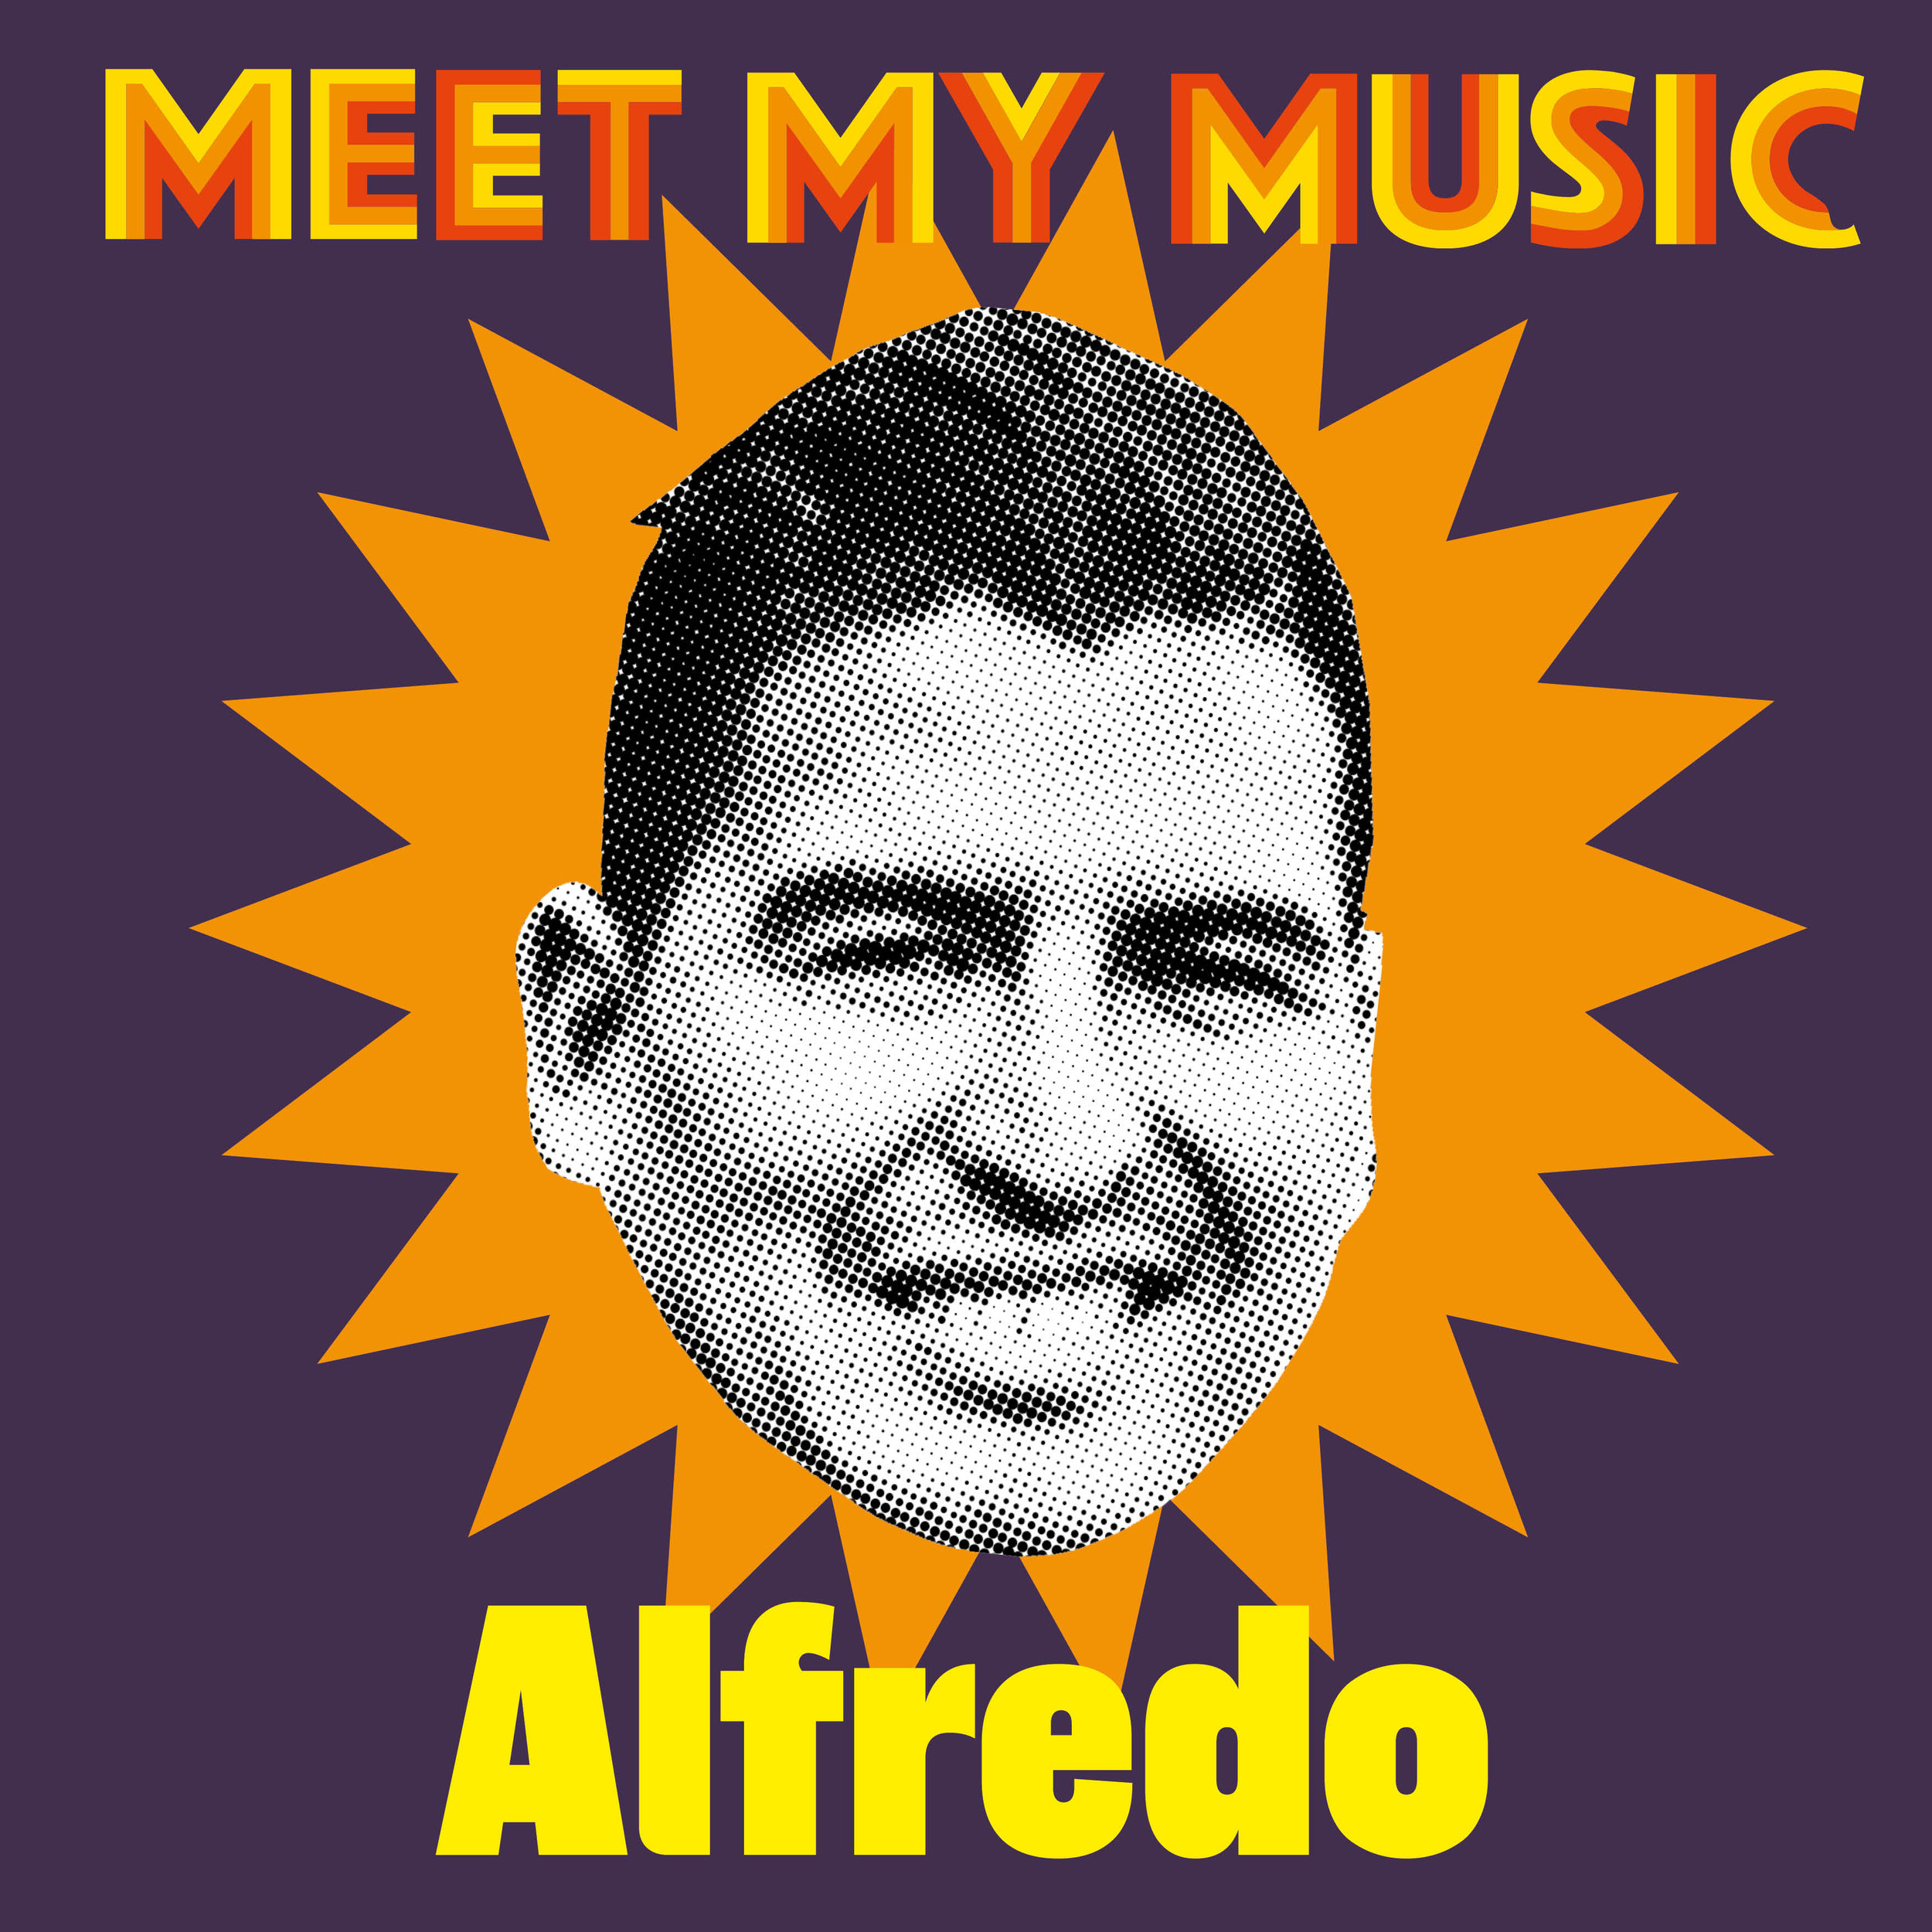 Meet my music Alfredo.jpg